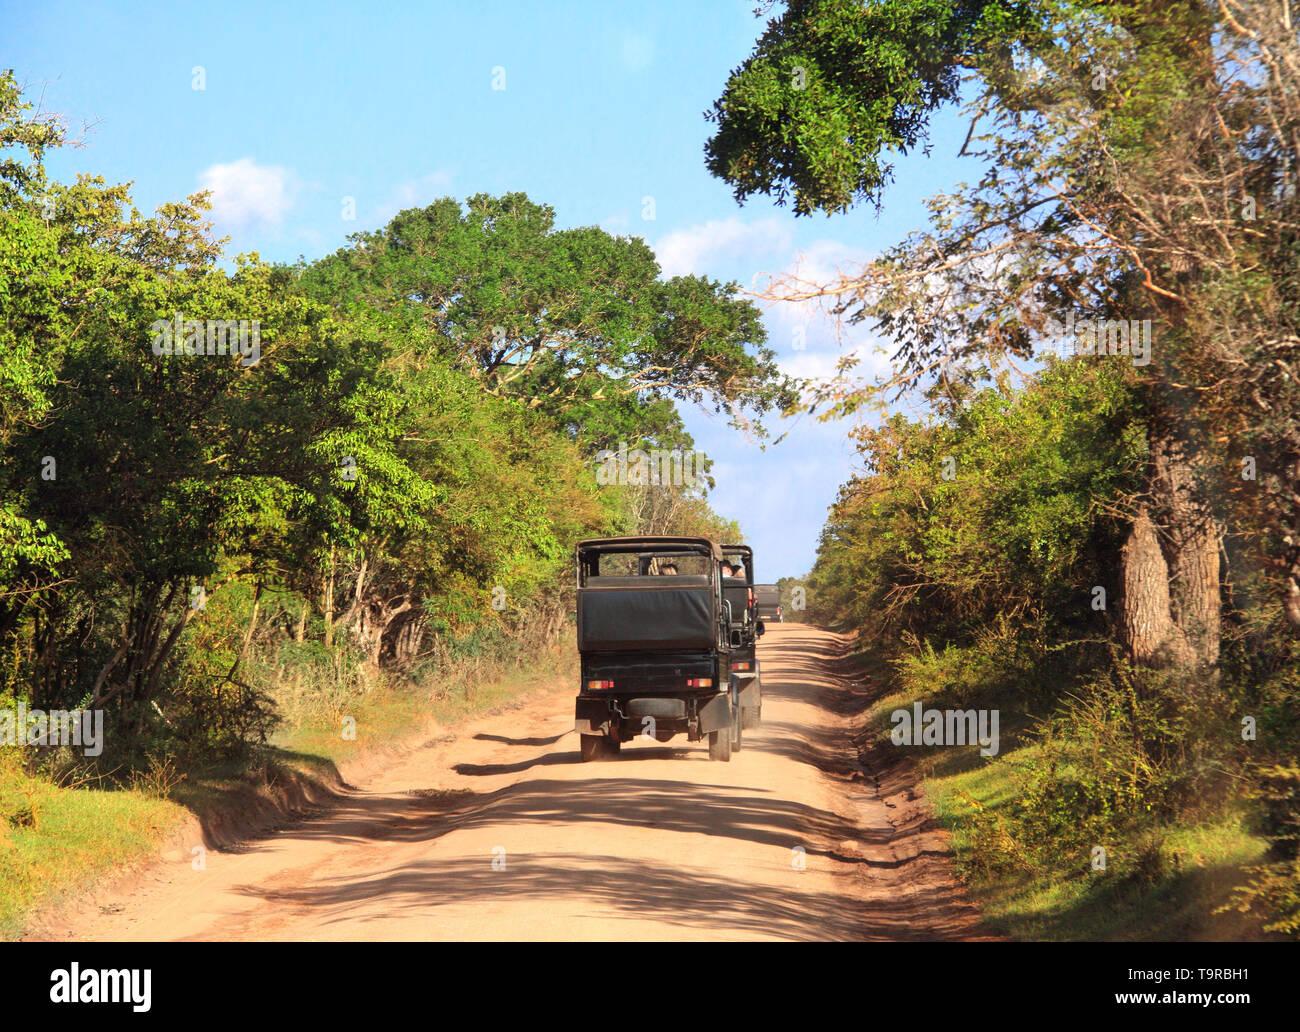 Car safari in Yala National Park. Tourists in cars on the dusty road. Sri Lanka Stock Photo